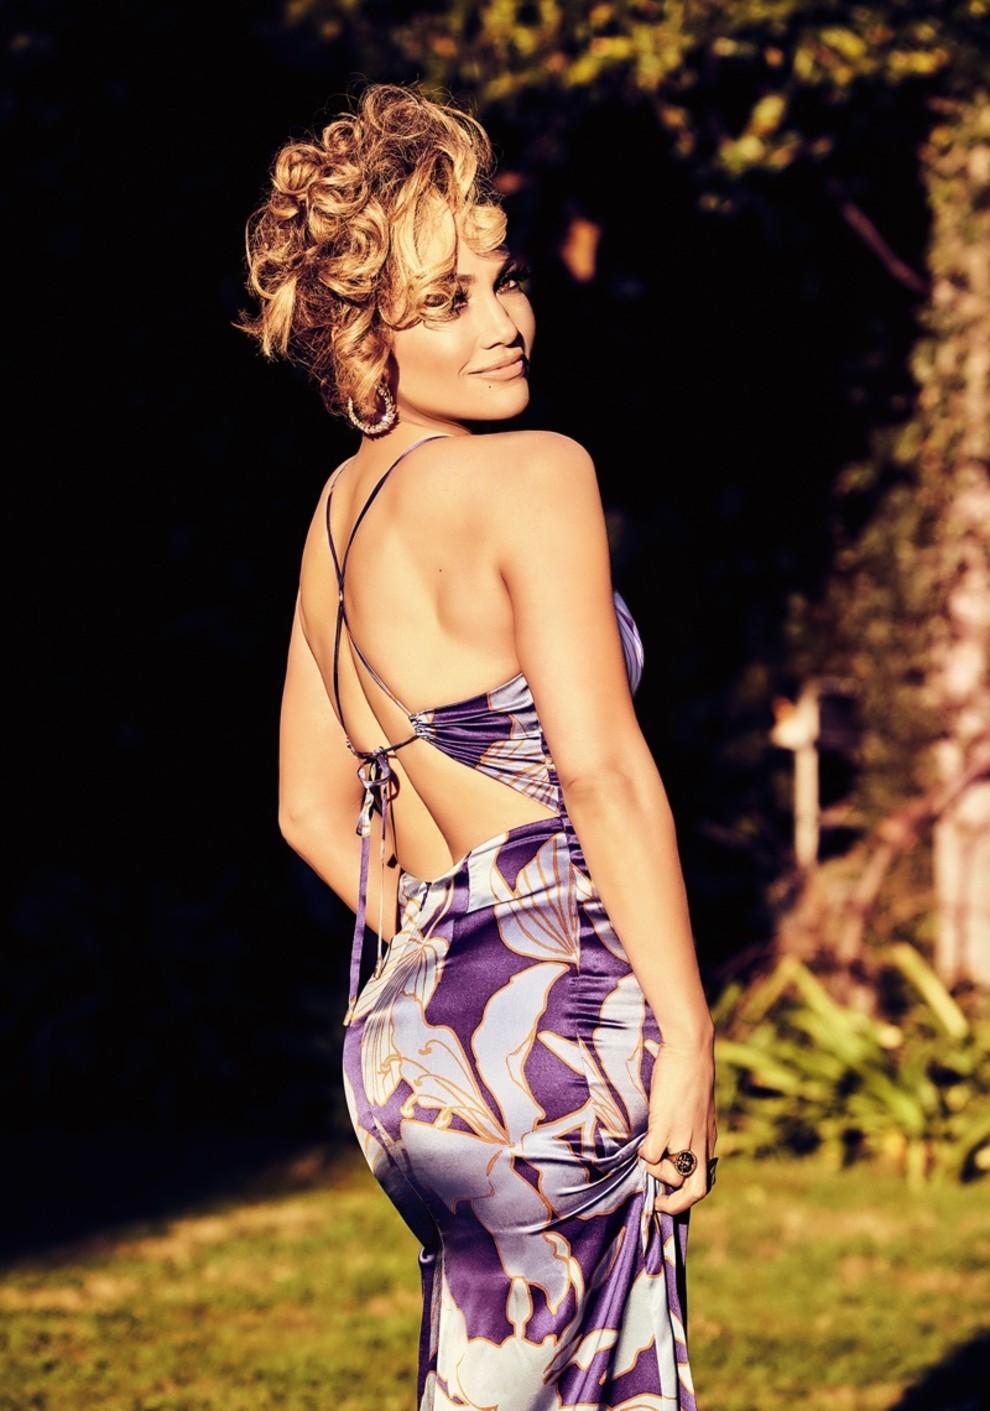 Дженнифер Лопес в рекламной кампании Guess весна-лето фотосессия